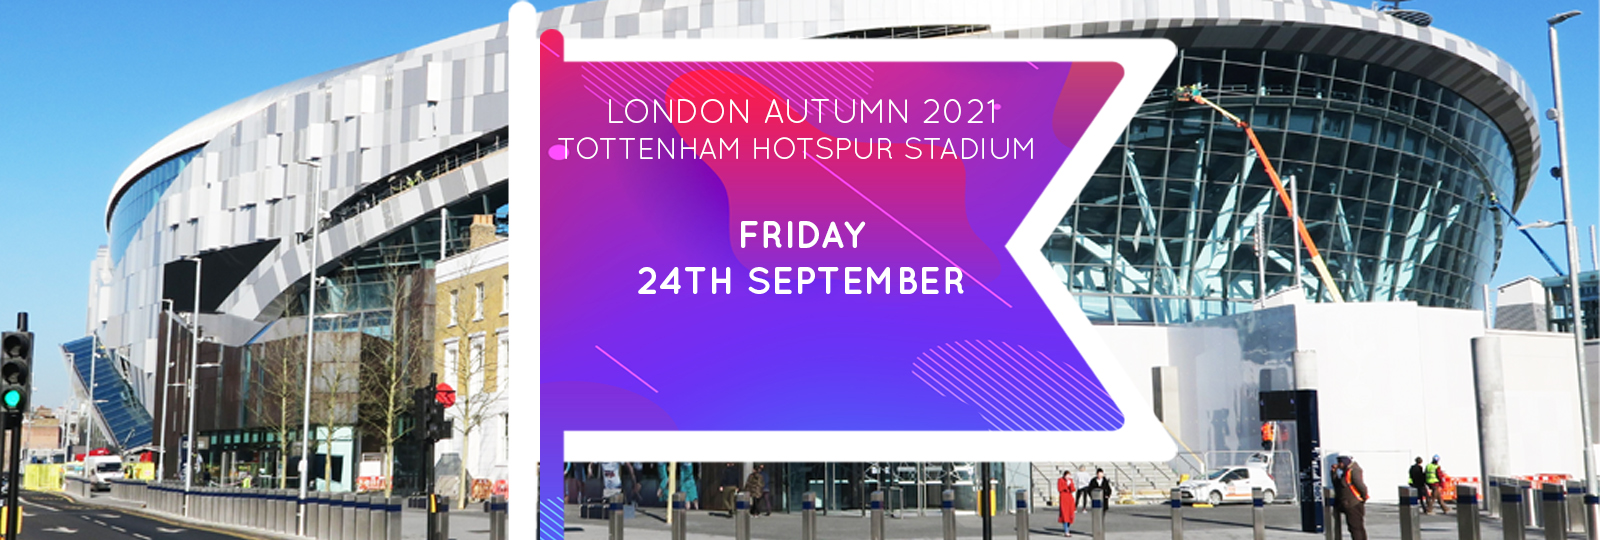 London Autumn 2021 Fair